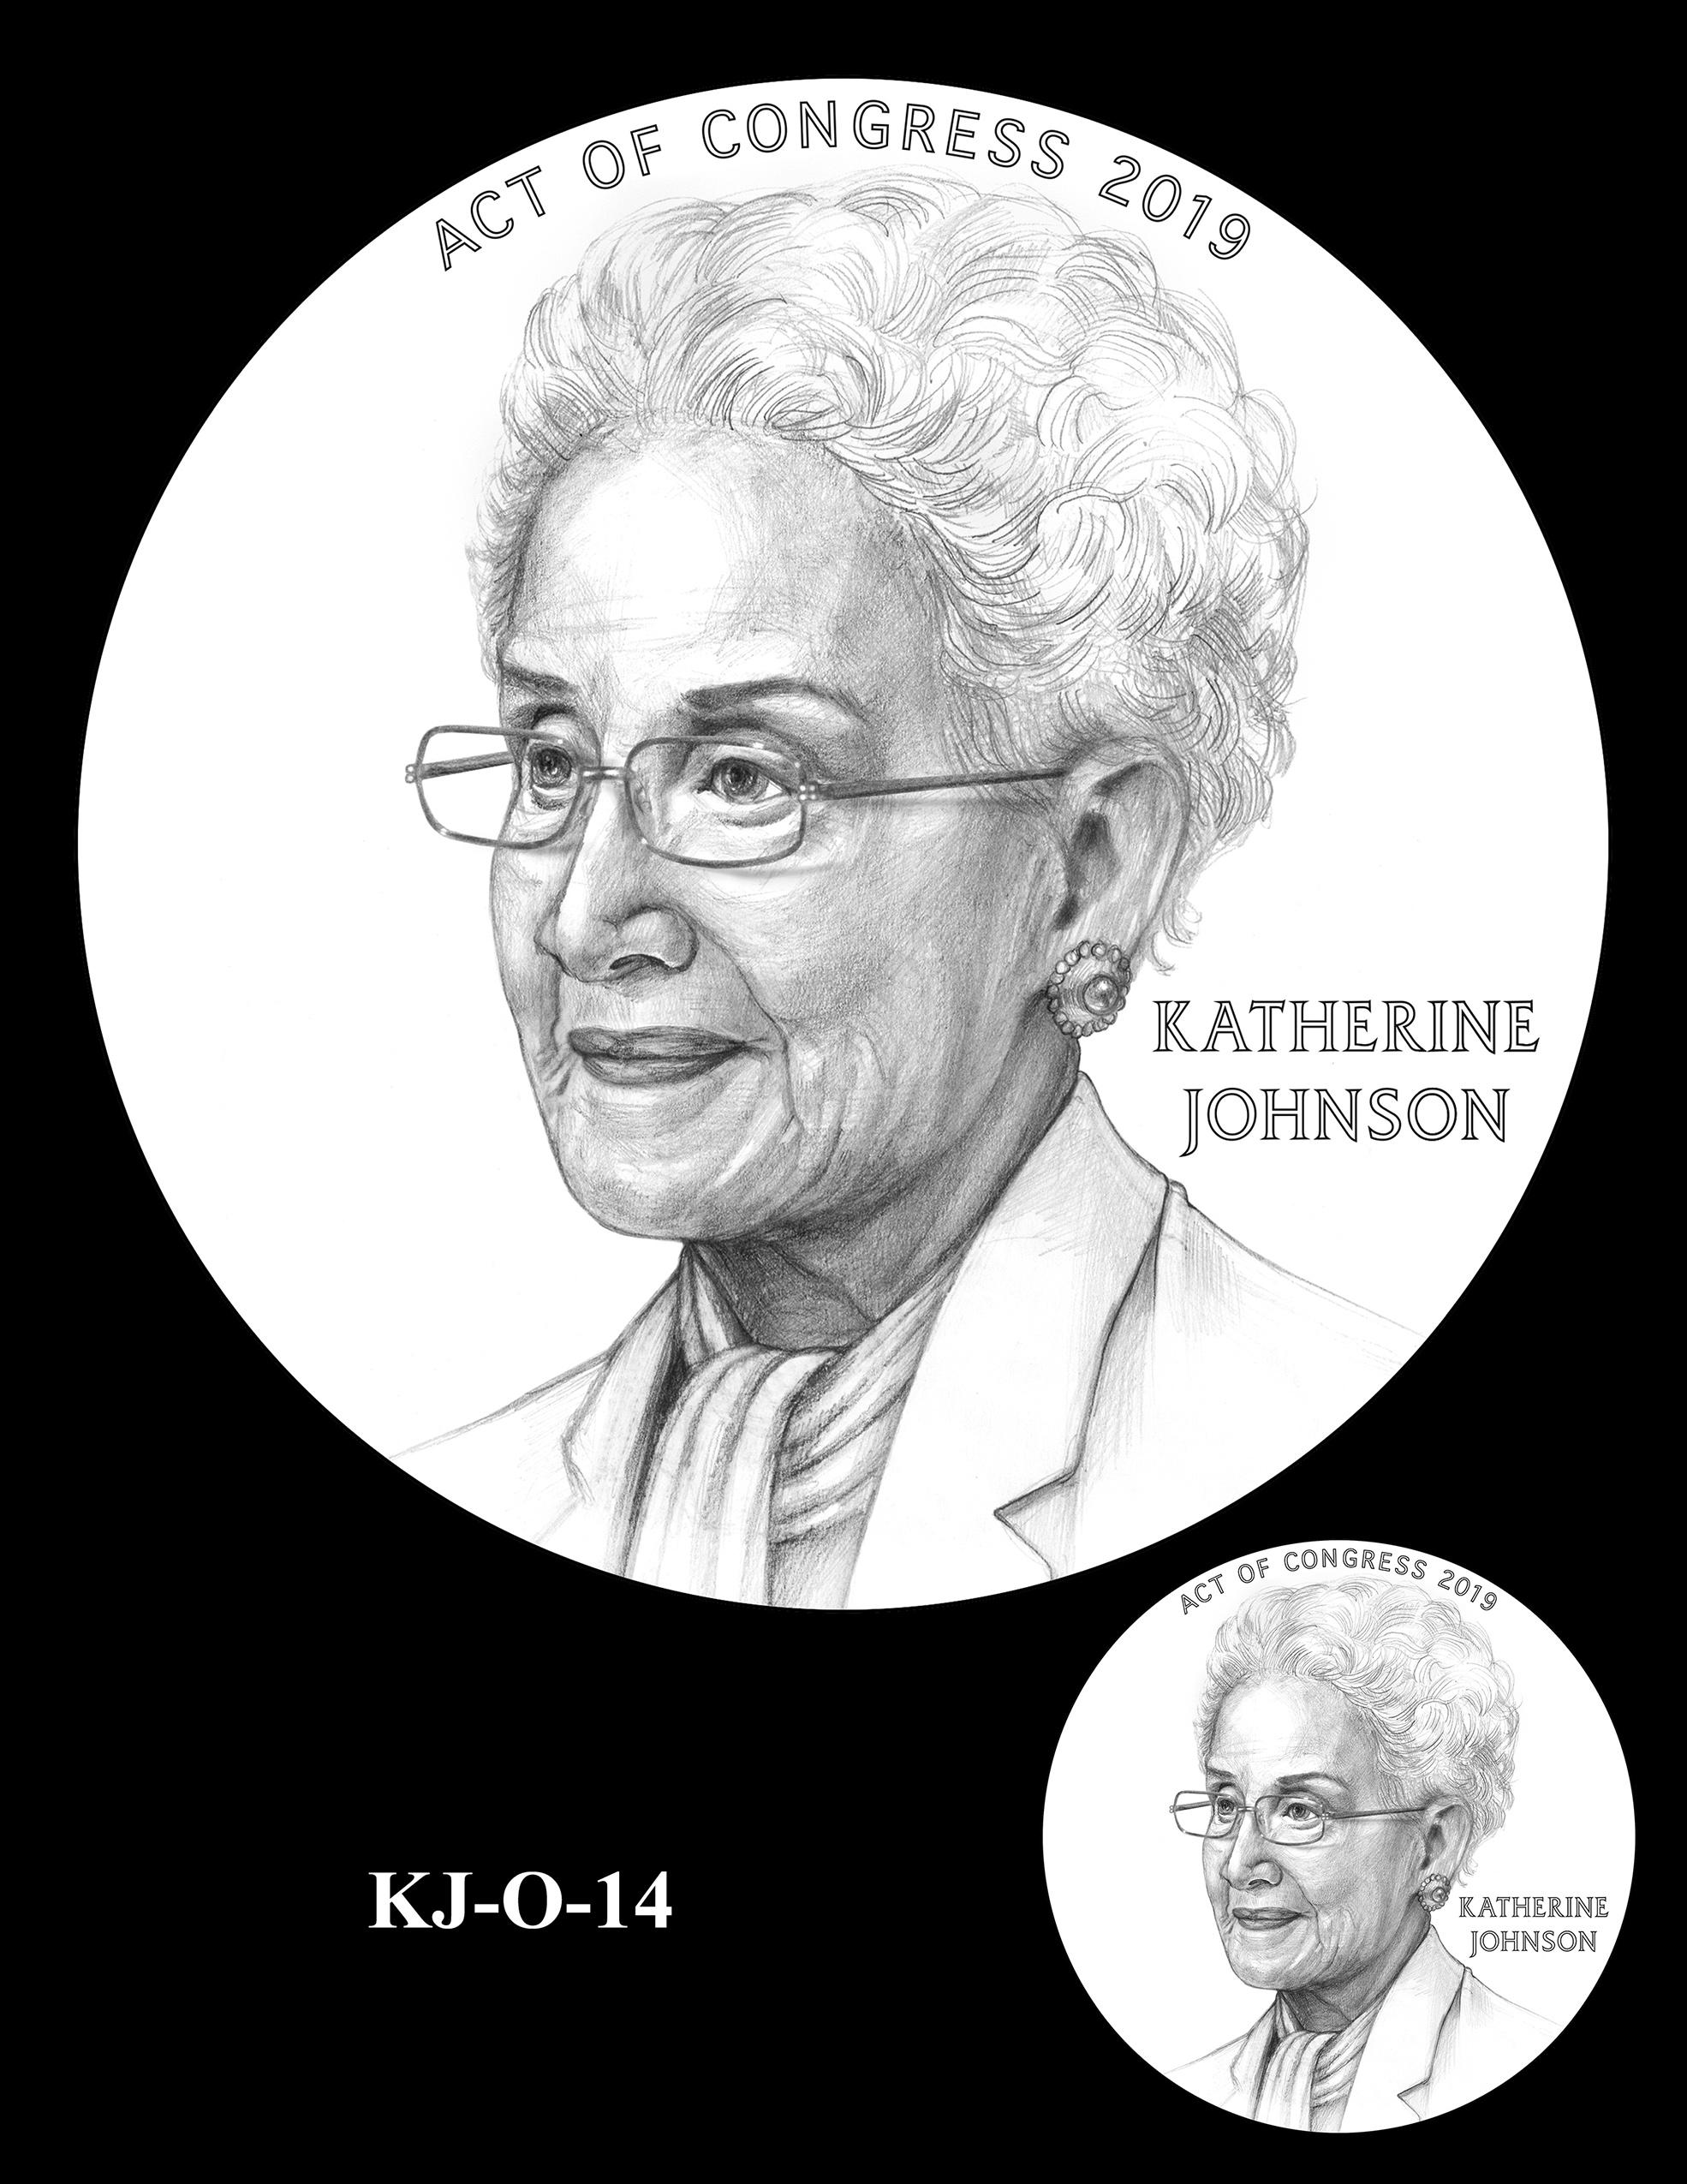 KJ-O-14 -- Katherine Johnson Congressional Gold Medal